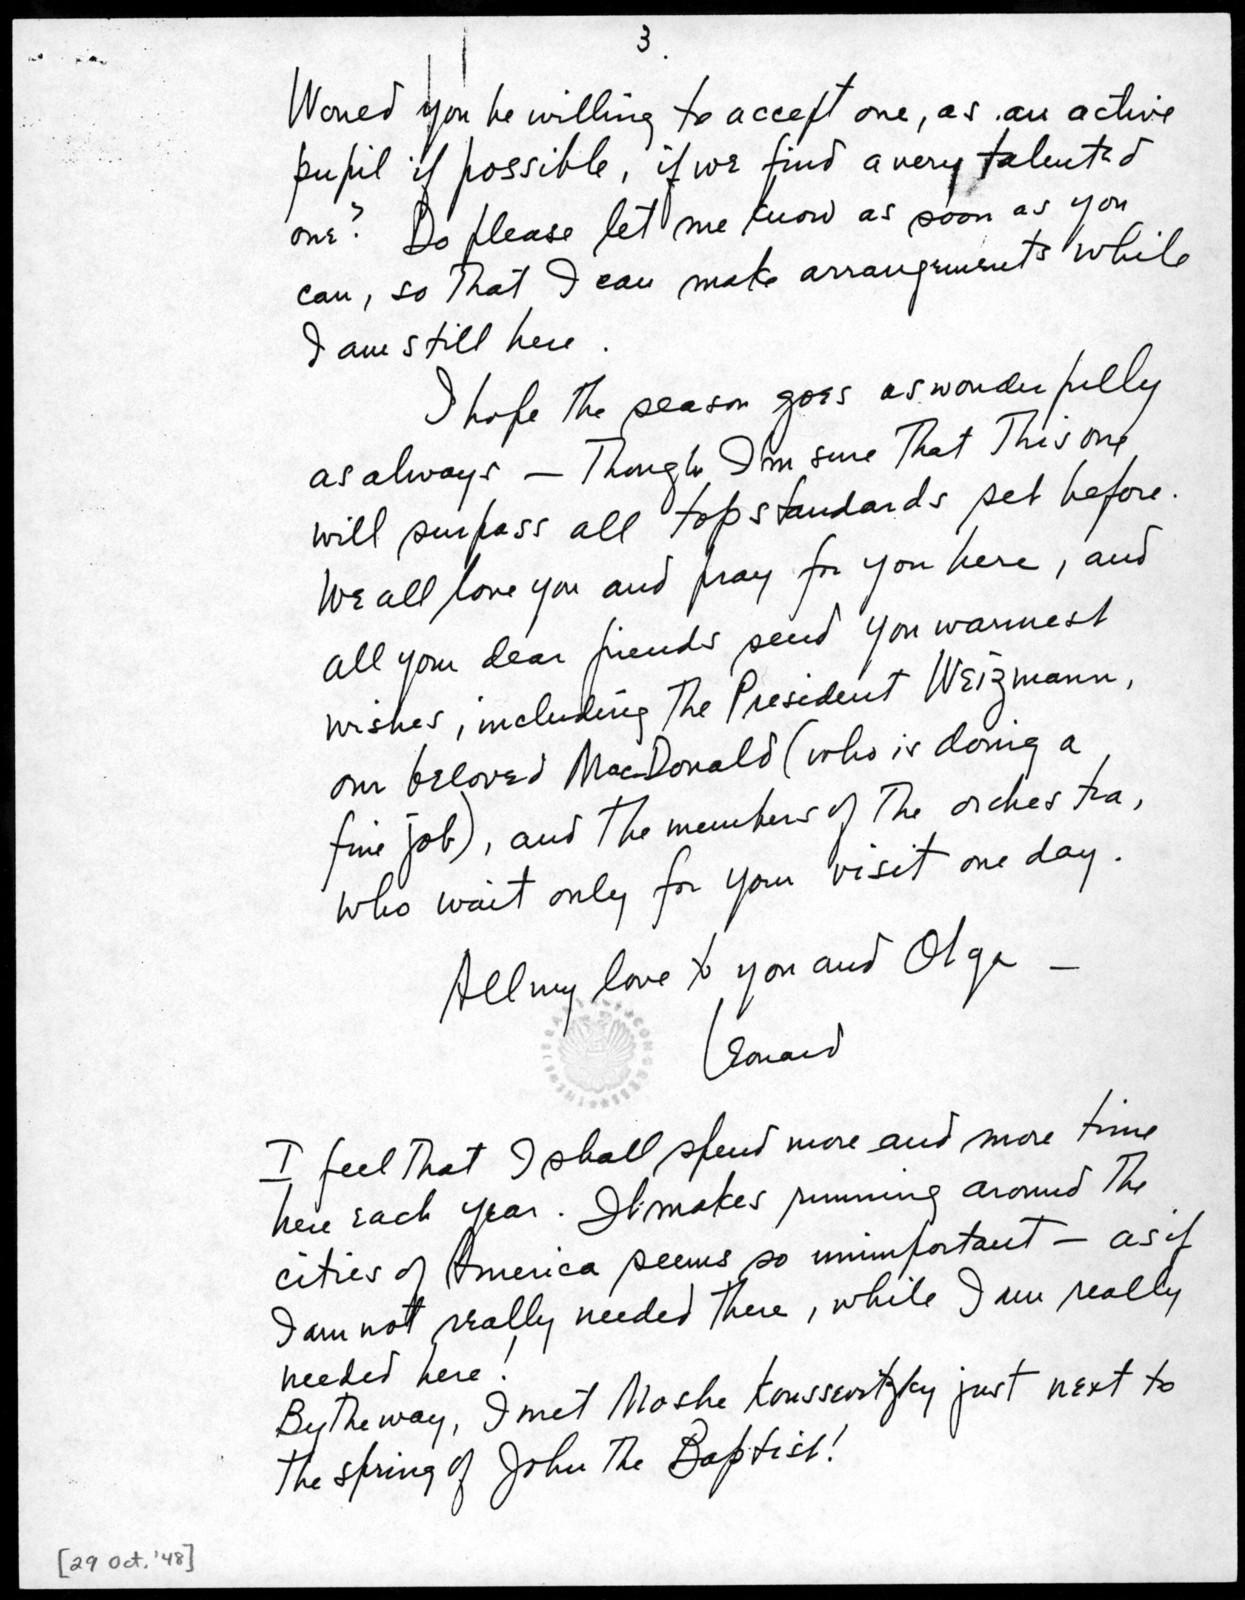 Letter from Leonard Bernstein to Serge Koussevitzky, October 29, 1948